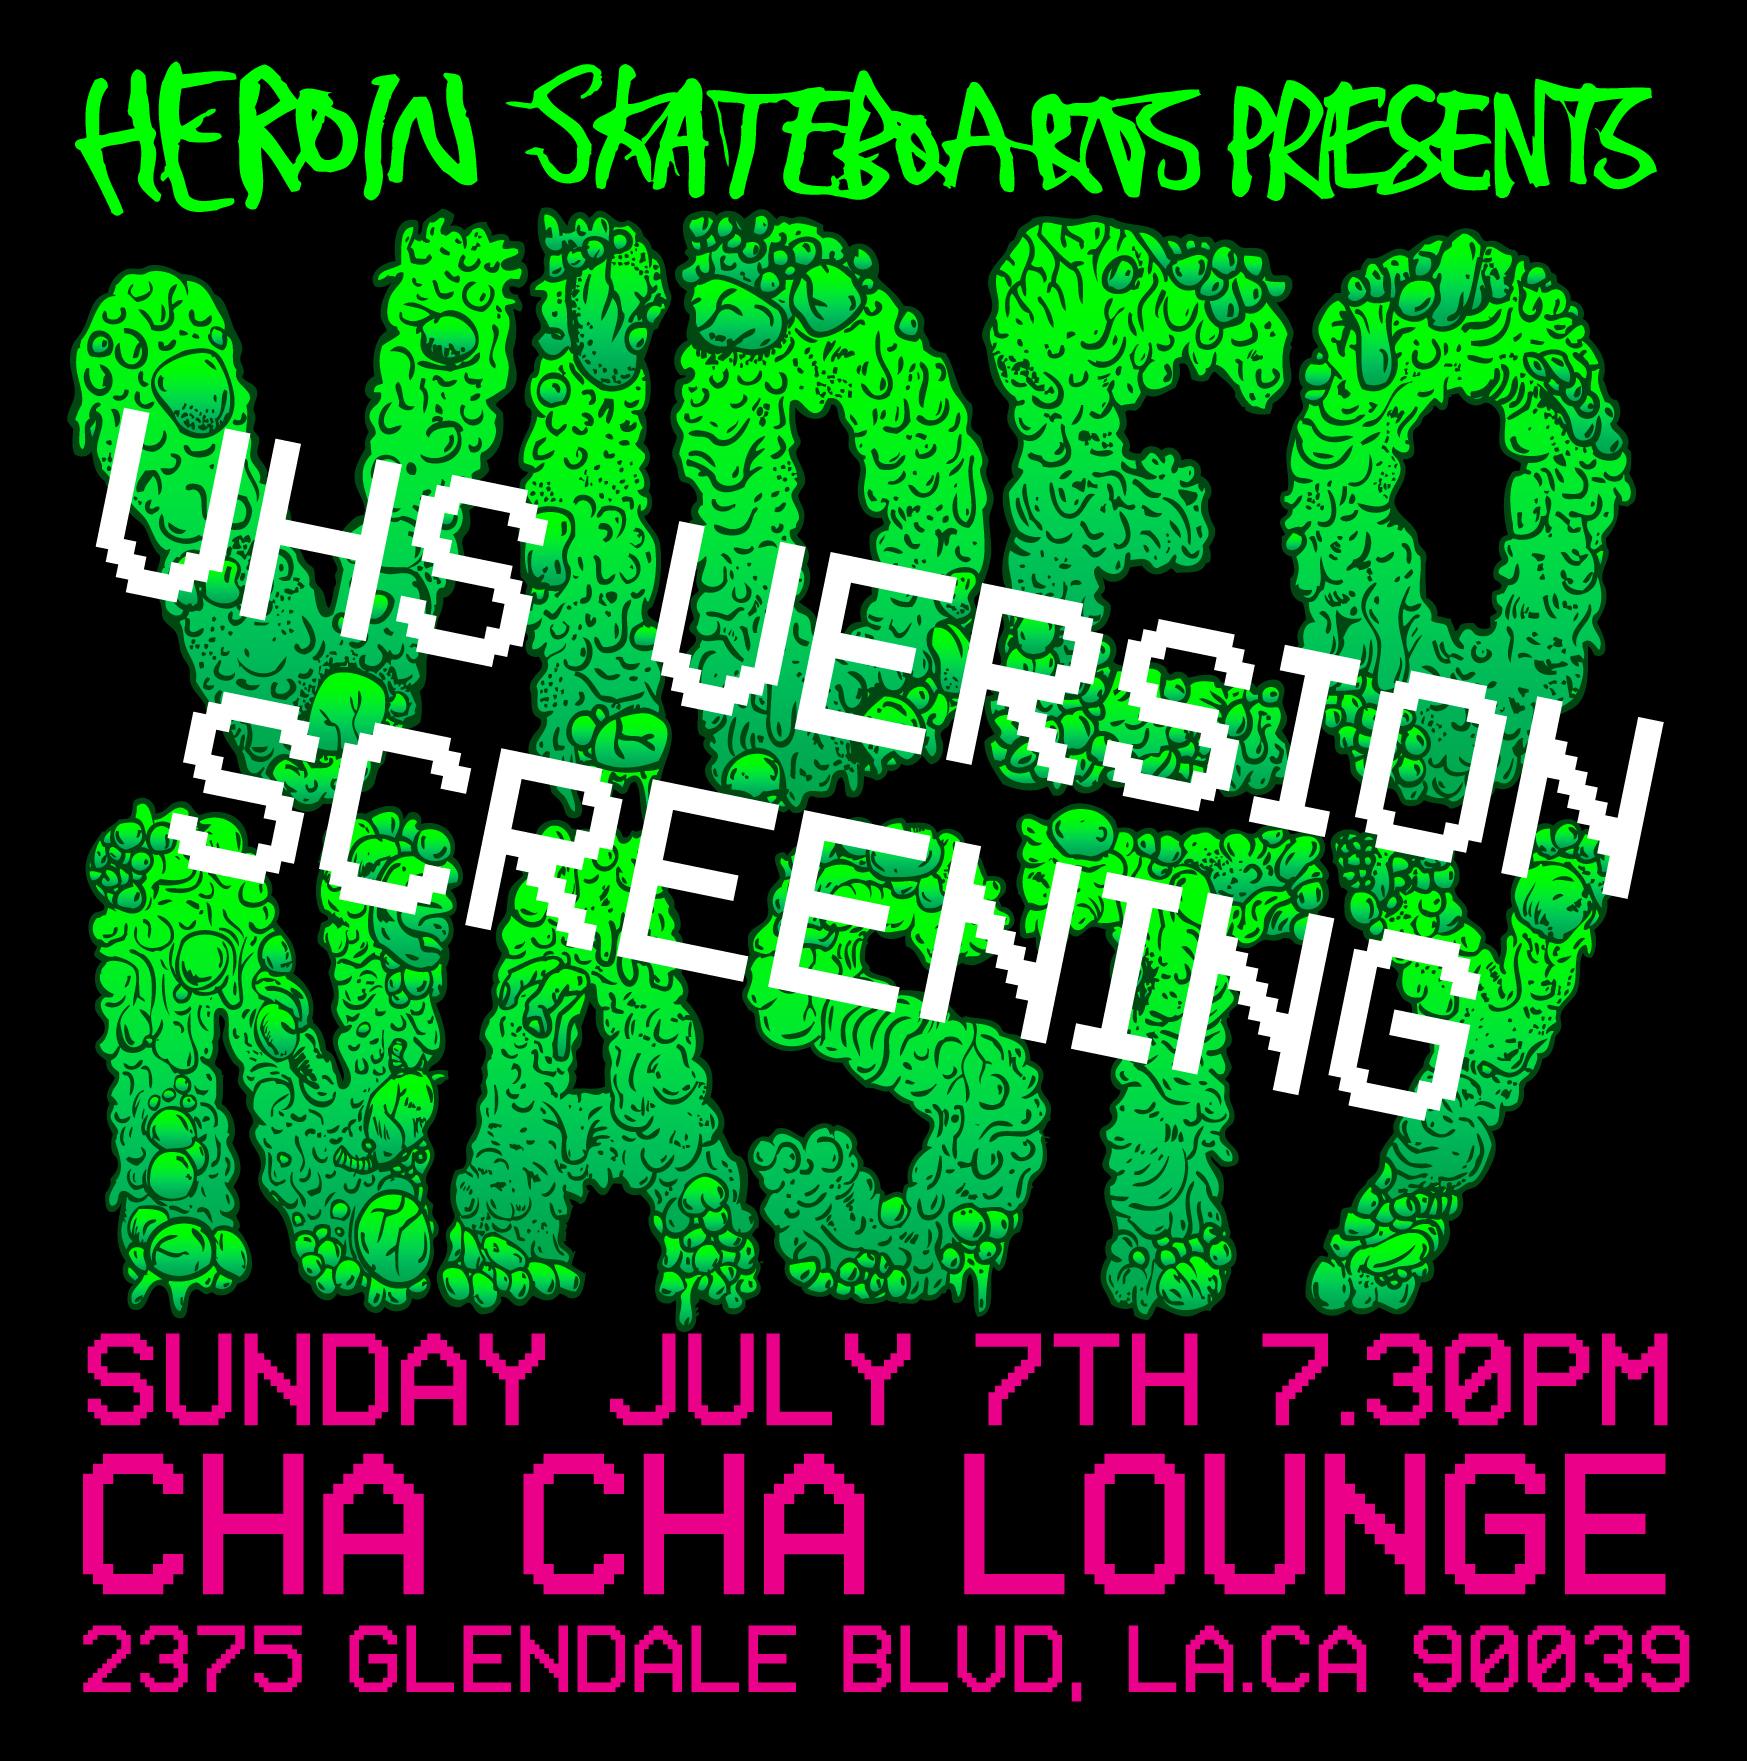 VHS_SCREENING_CHA_CHA.jpg